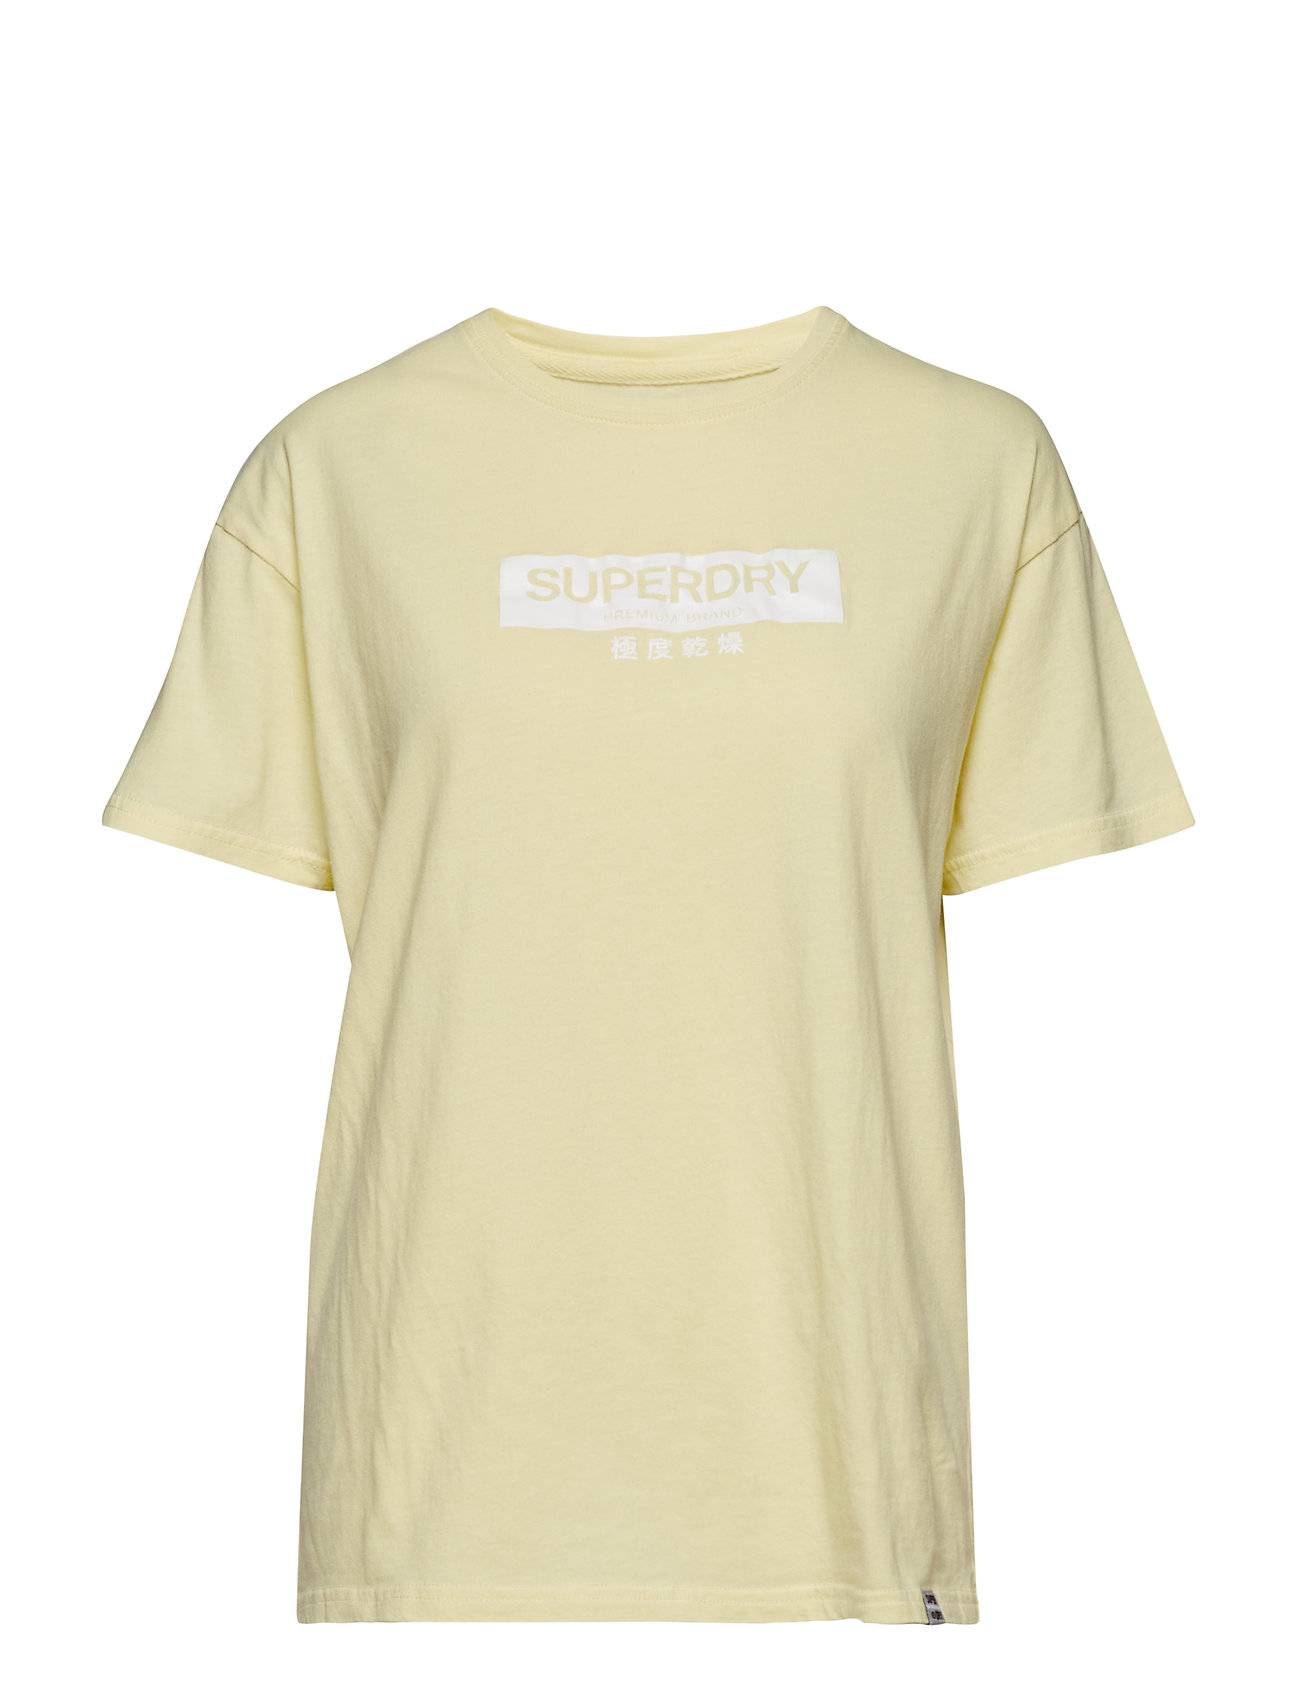 Superdry Premium Brand Classic Portland Tee T-shirts & Tops Short-sleeved Keltainen